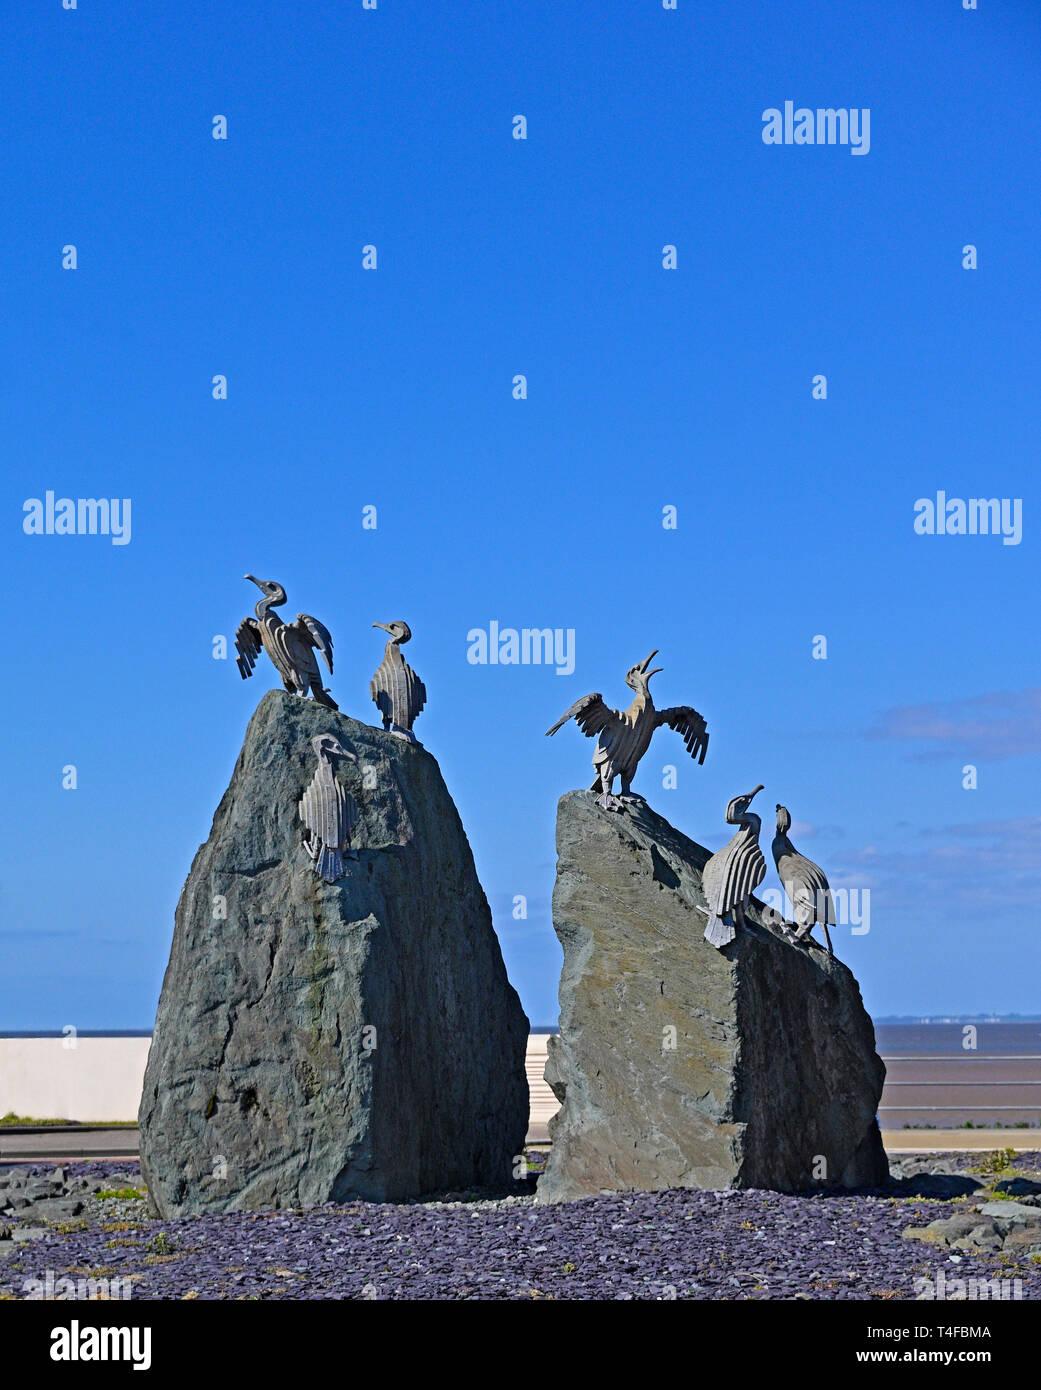 Cormorant bird sculpture. The Tern Project. The Promenade, Morecambe, Lancashire, England, United Kingdom, Europe. - Stock Image